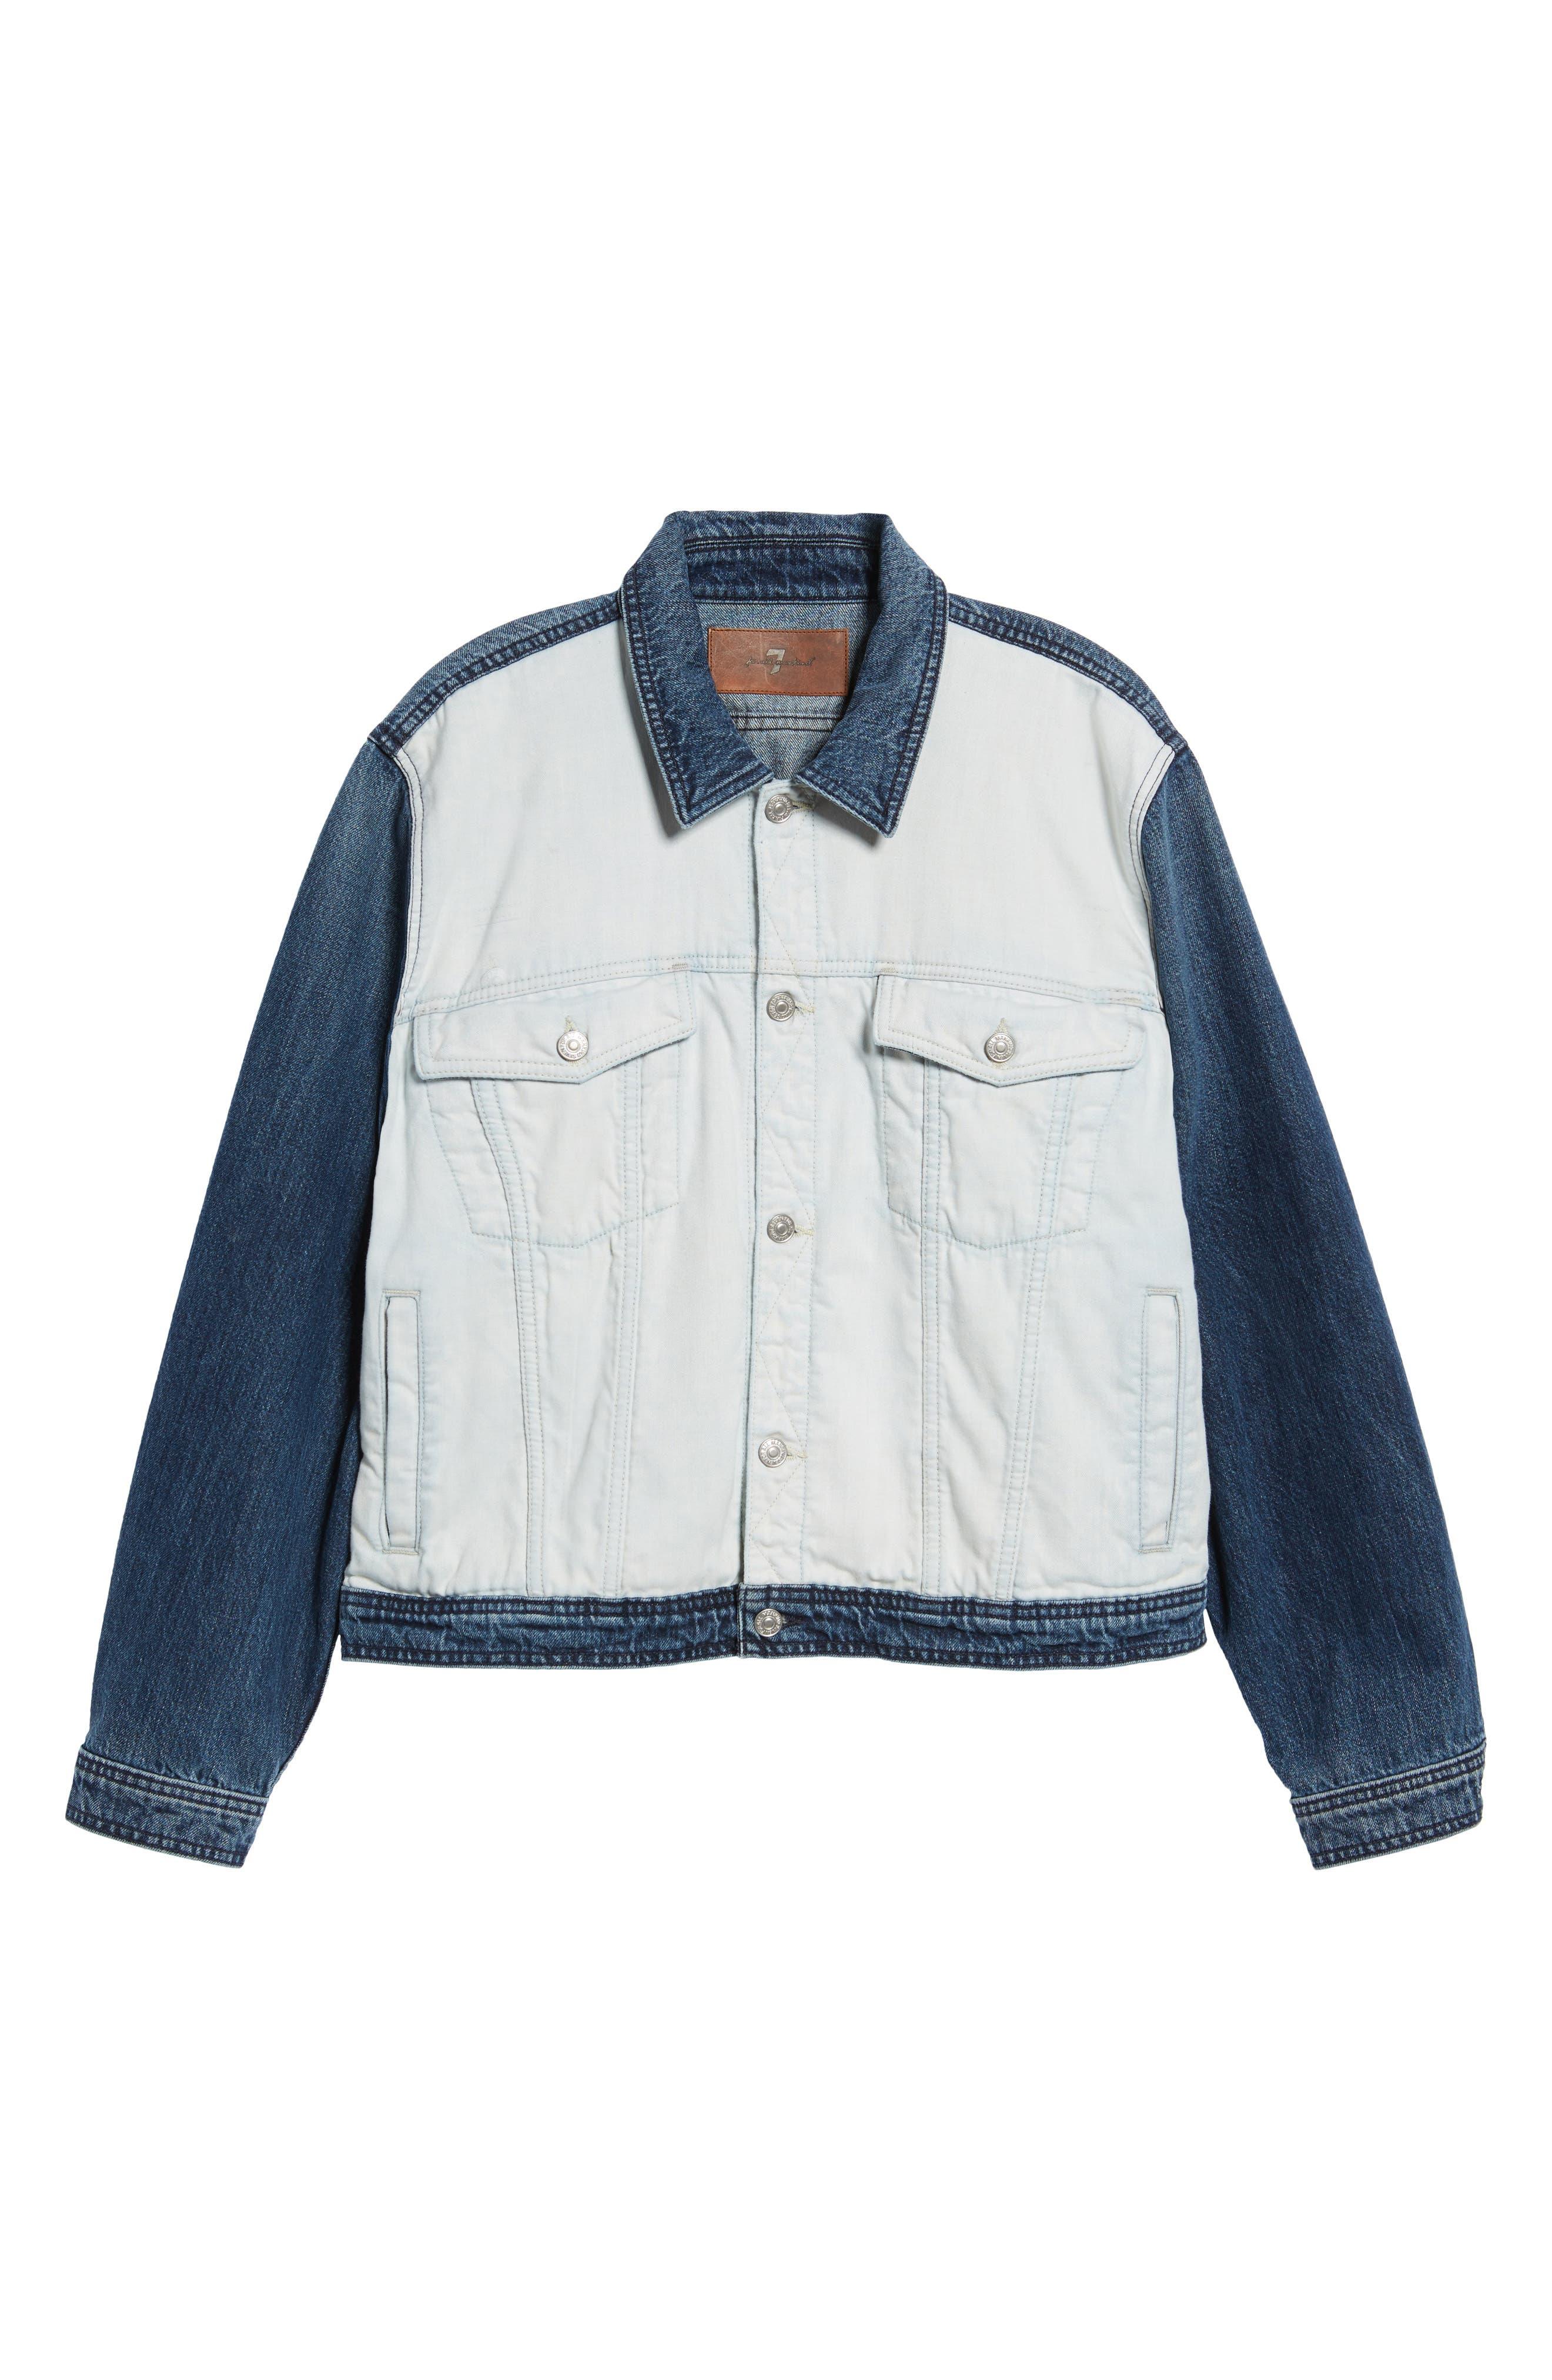 Inside Out Trucker Jacket,                             Alternate thumbnail 6, color,                             Vintage Blue